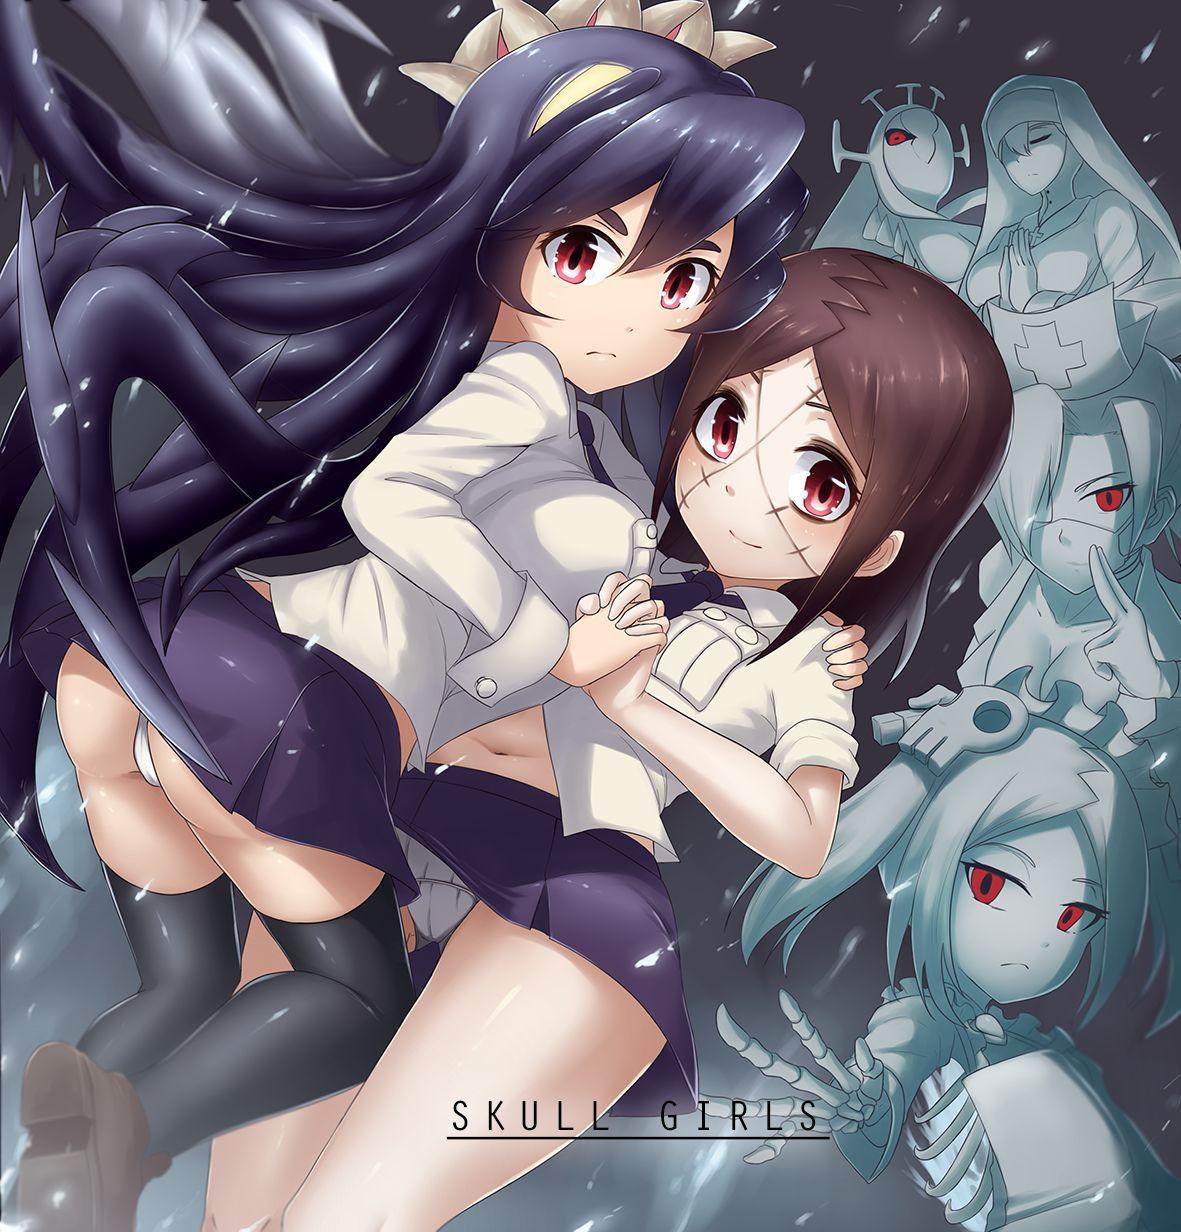 samson_(skullgirls)004